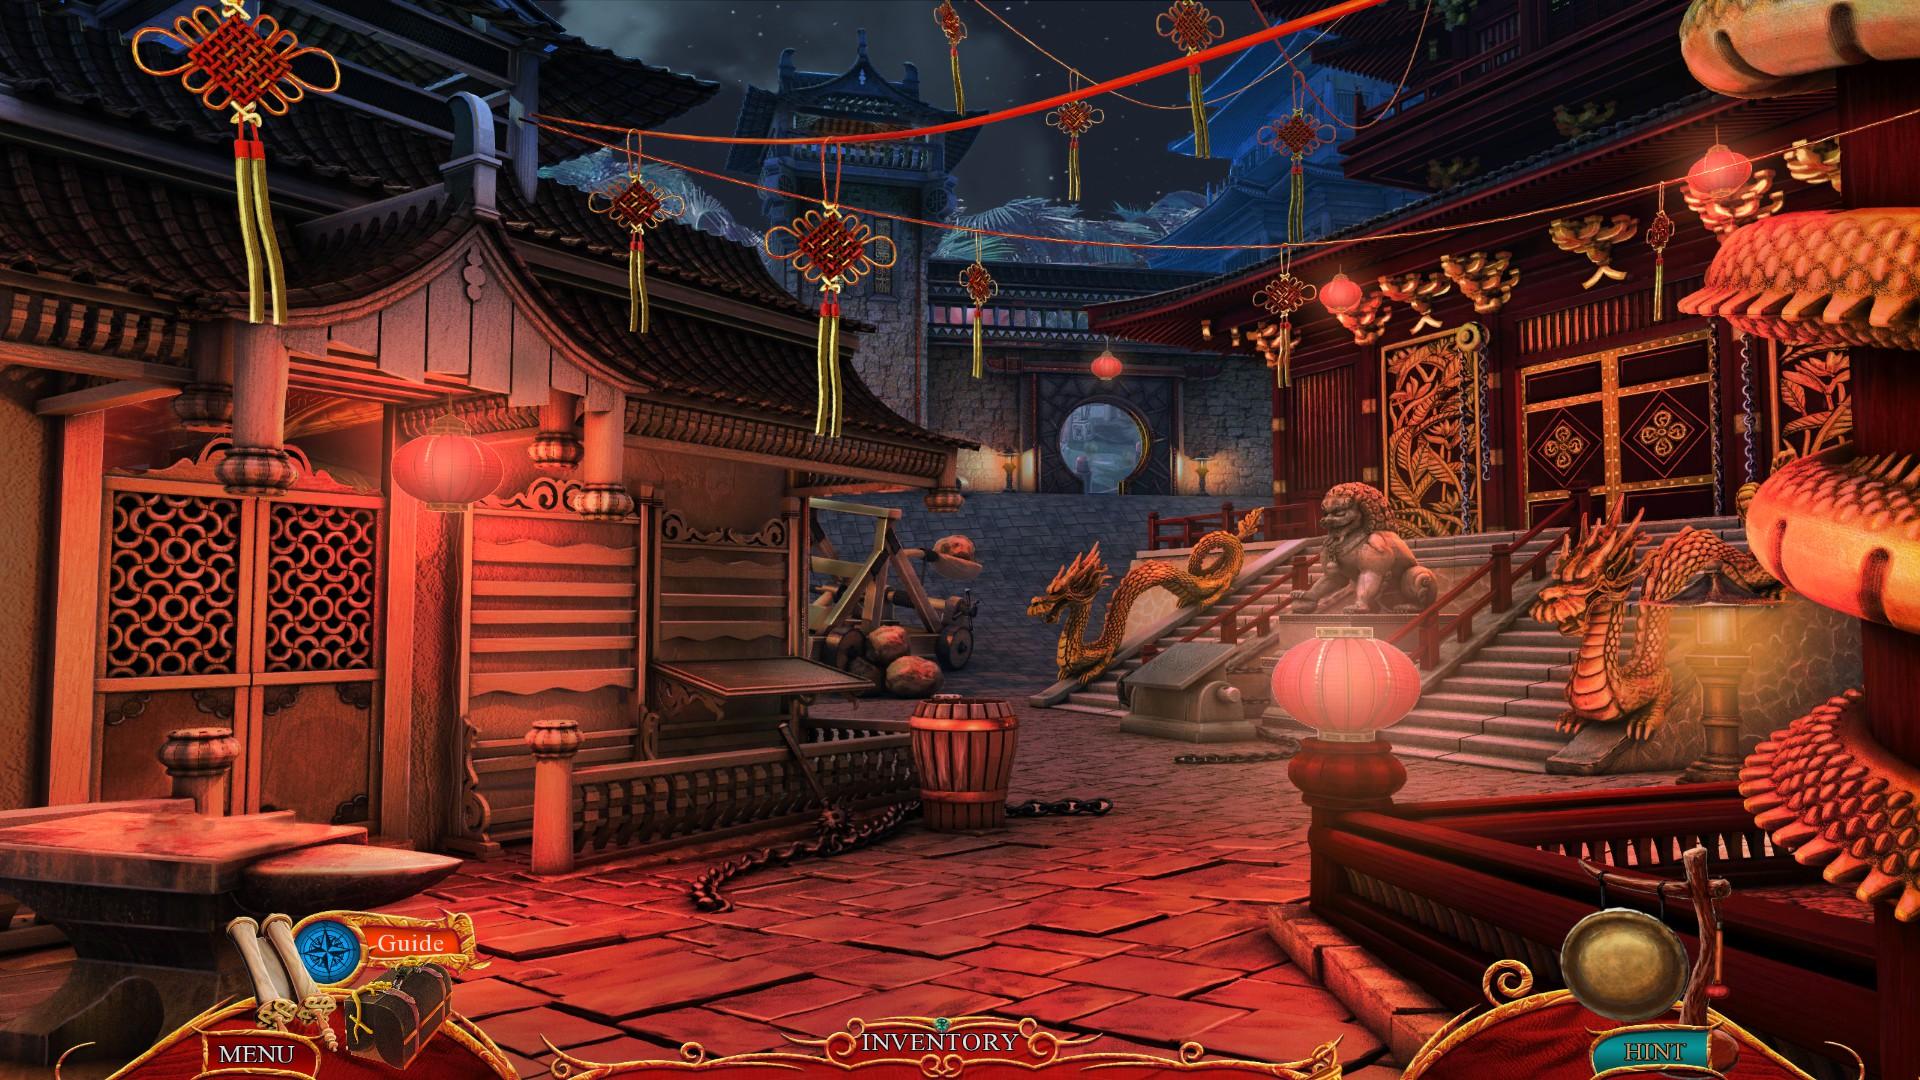 Myths of the World 1: Chinese Healer 89A5FEC895FE18EFF95F78FFE114BAEA4CBC64BC